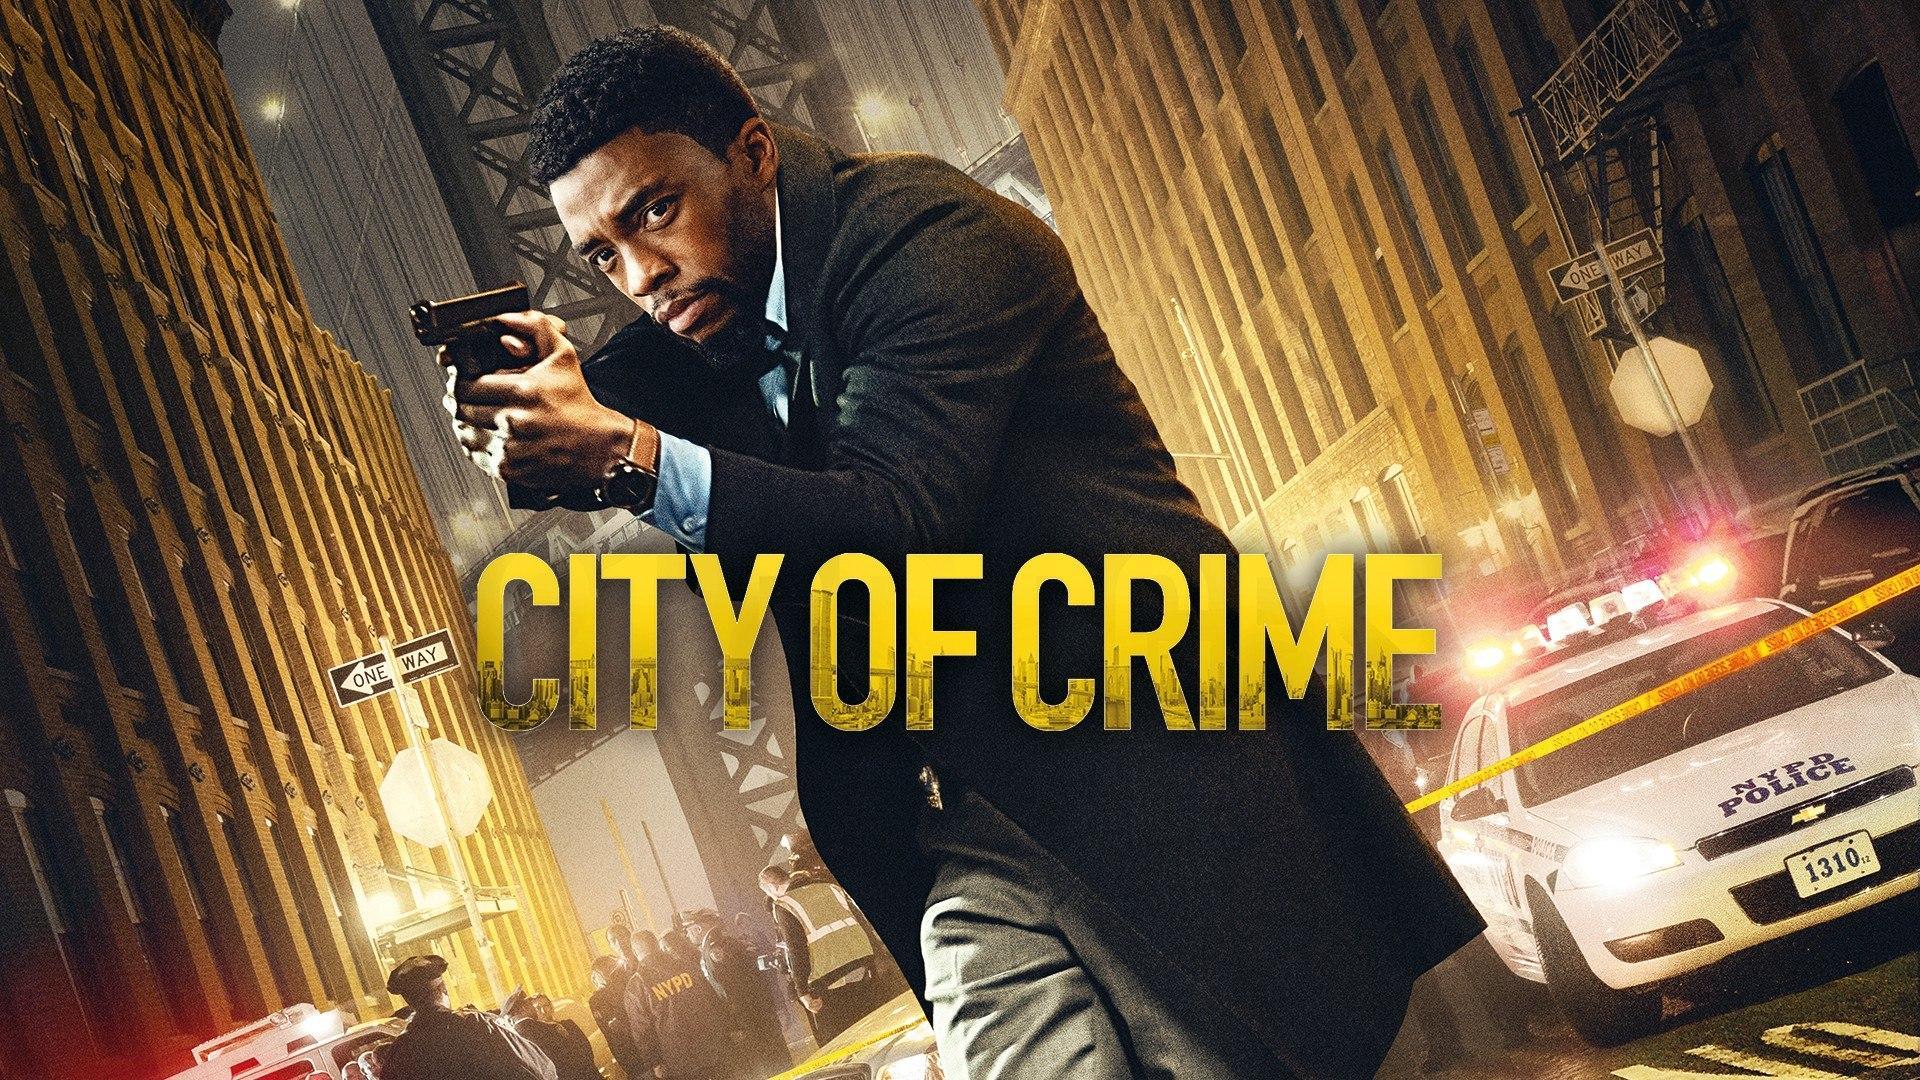 Lunedi 10 Agosto 2020 Sky Cinema HD, City of Crime